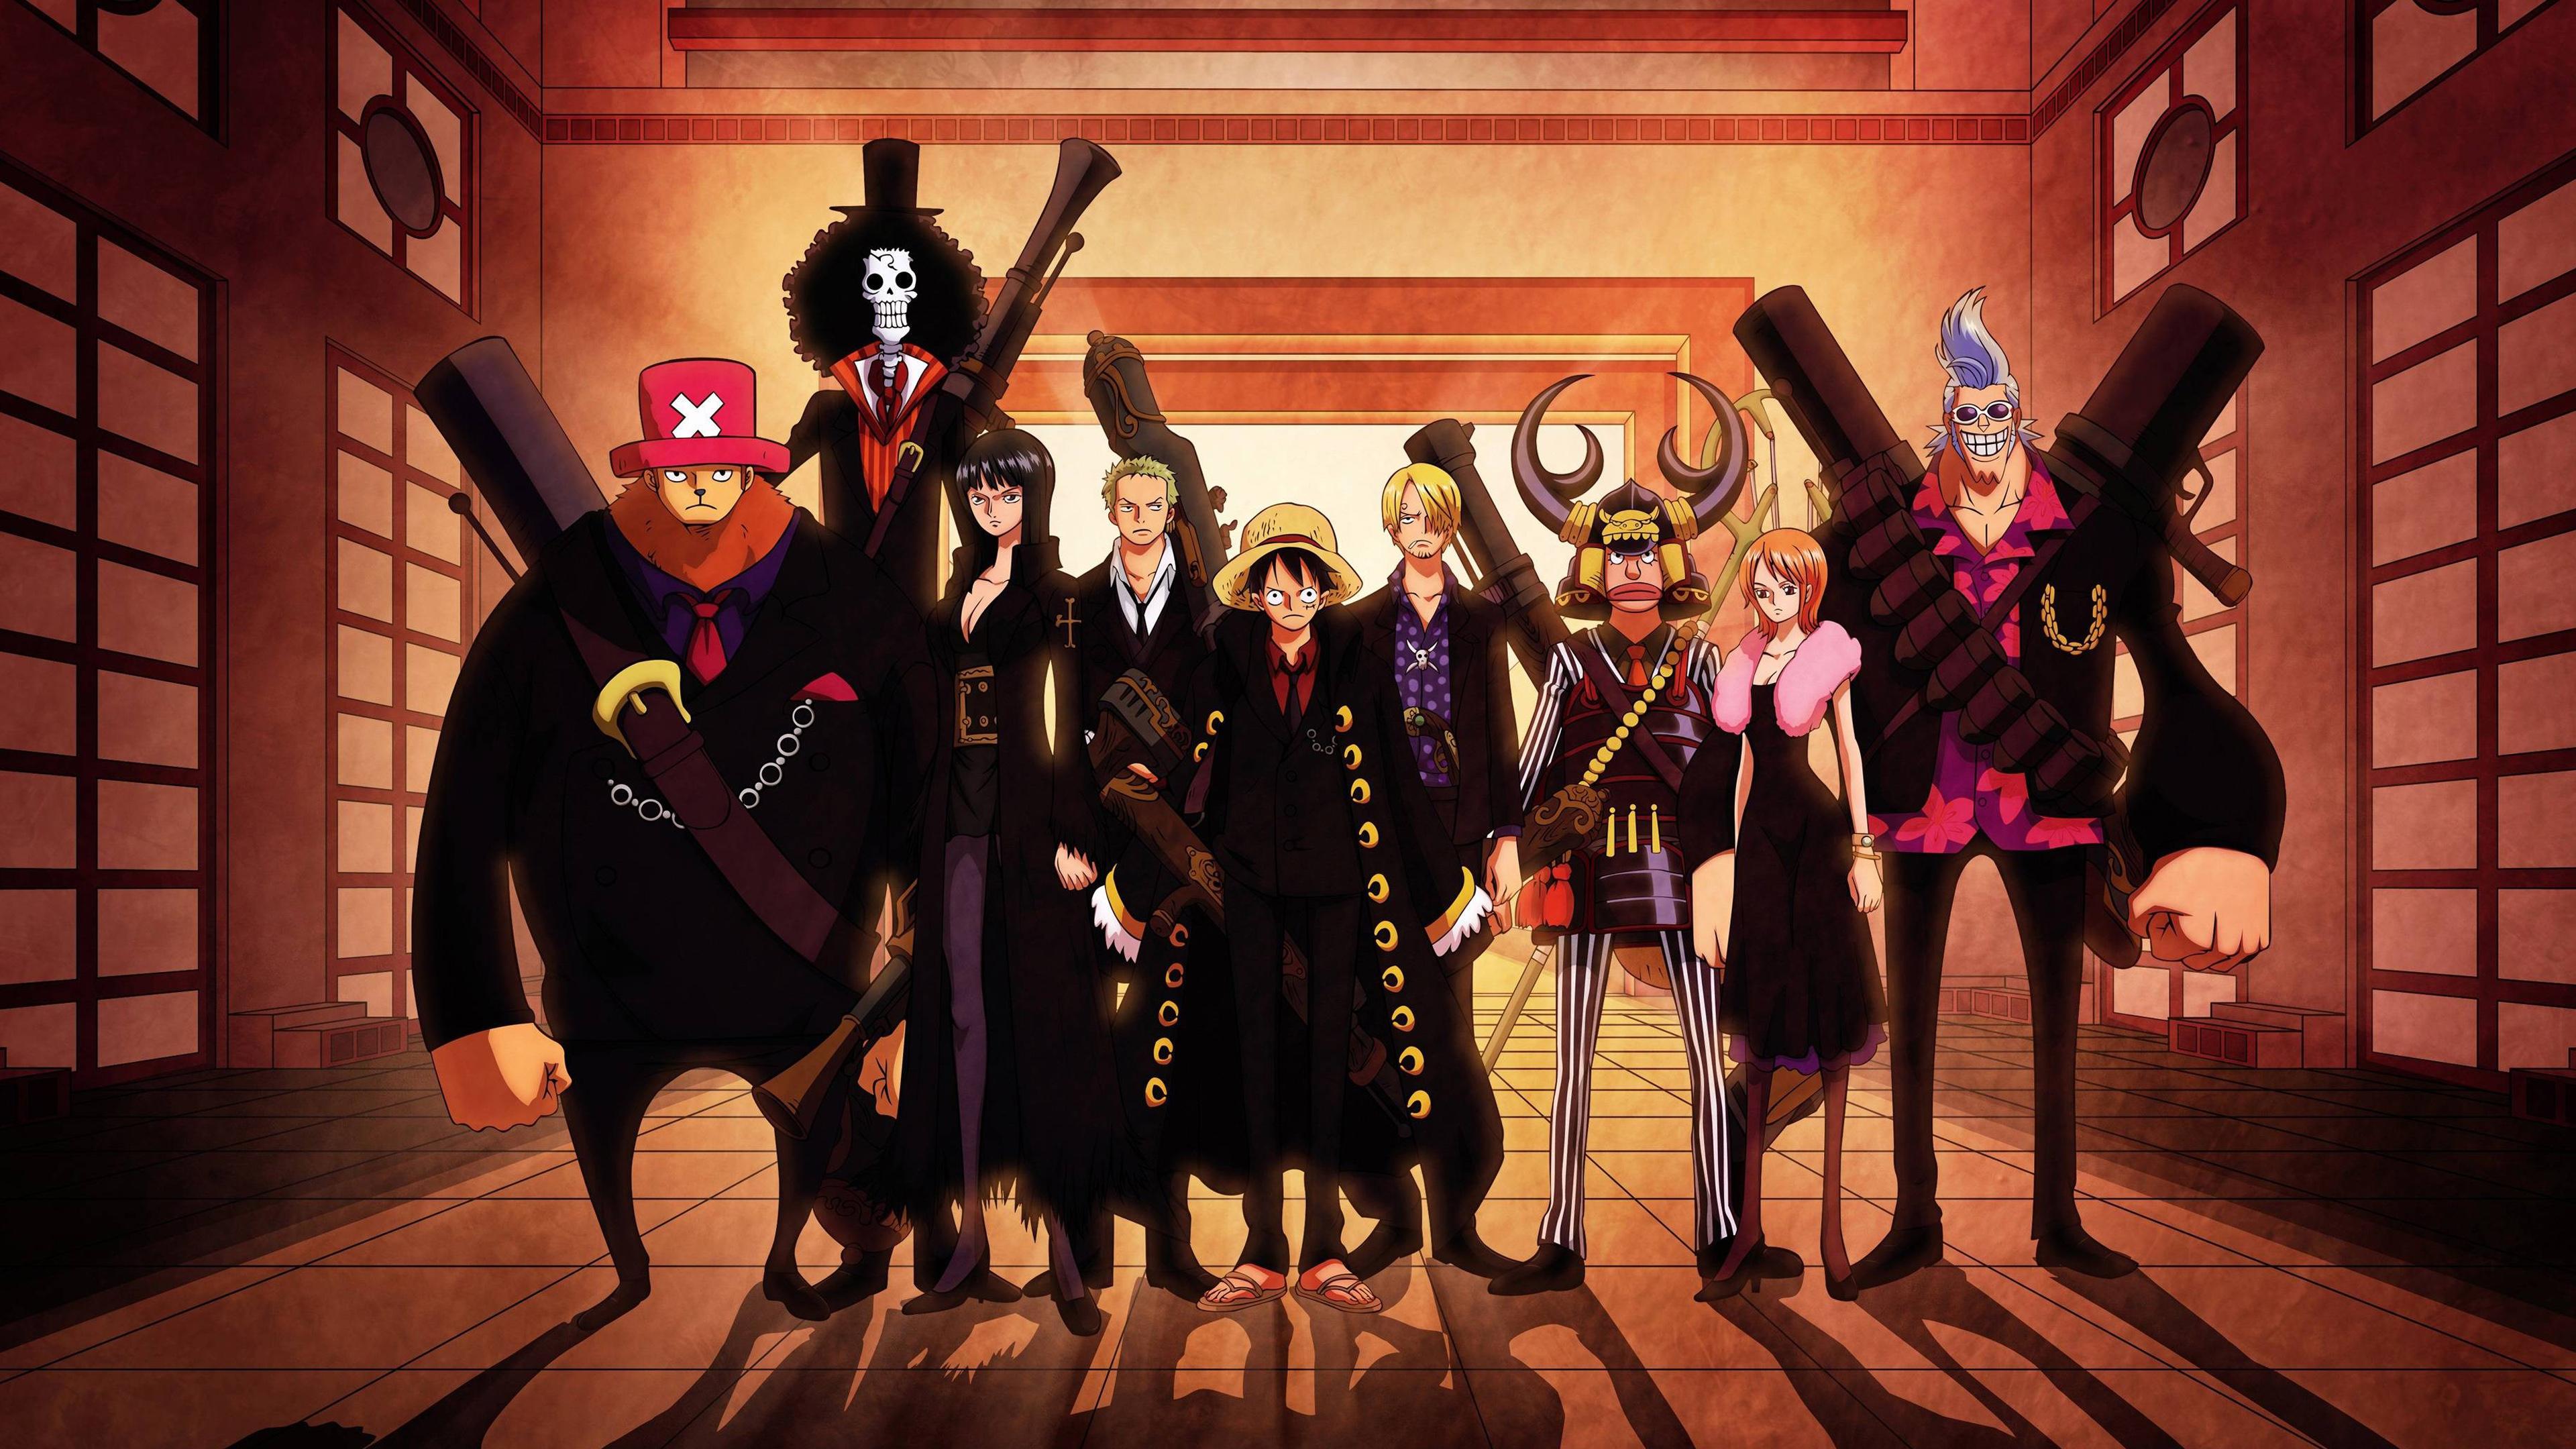 Wallpaper 4k One Piece Anime Anime Megumin Piece